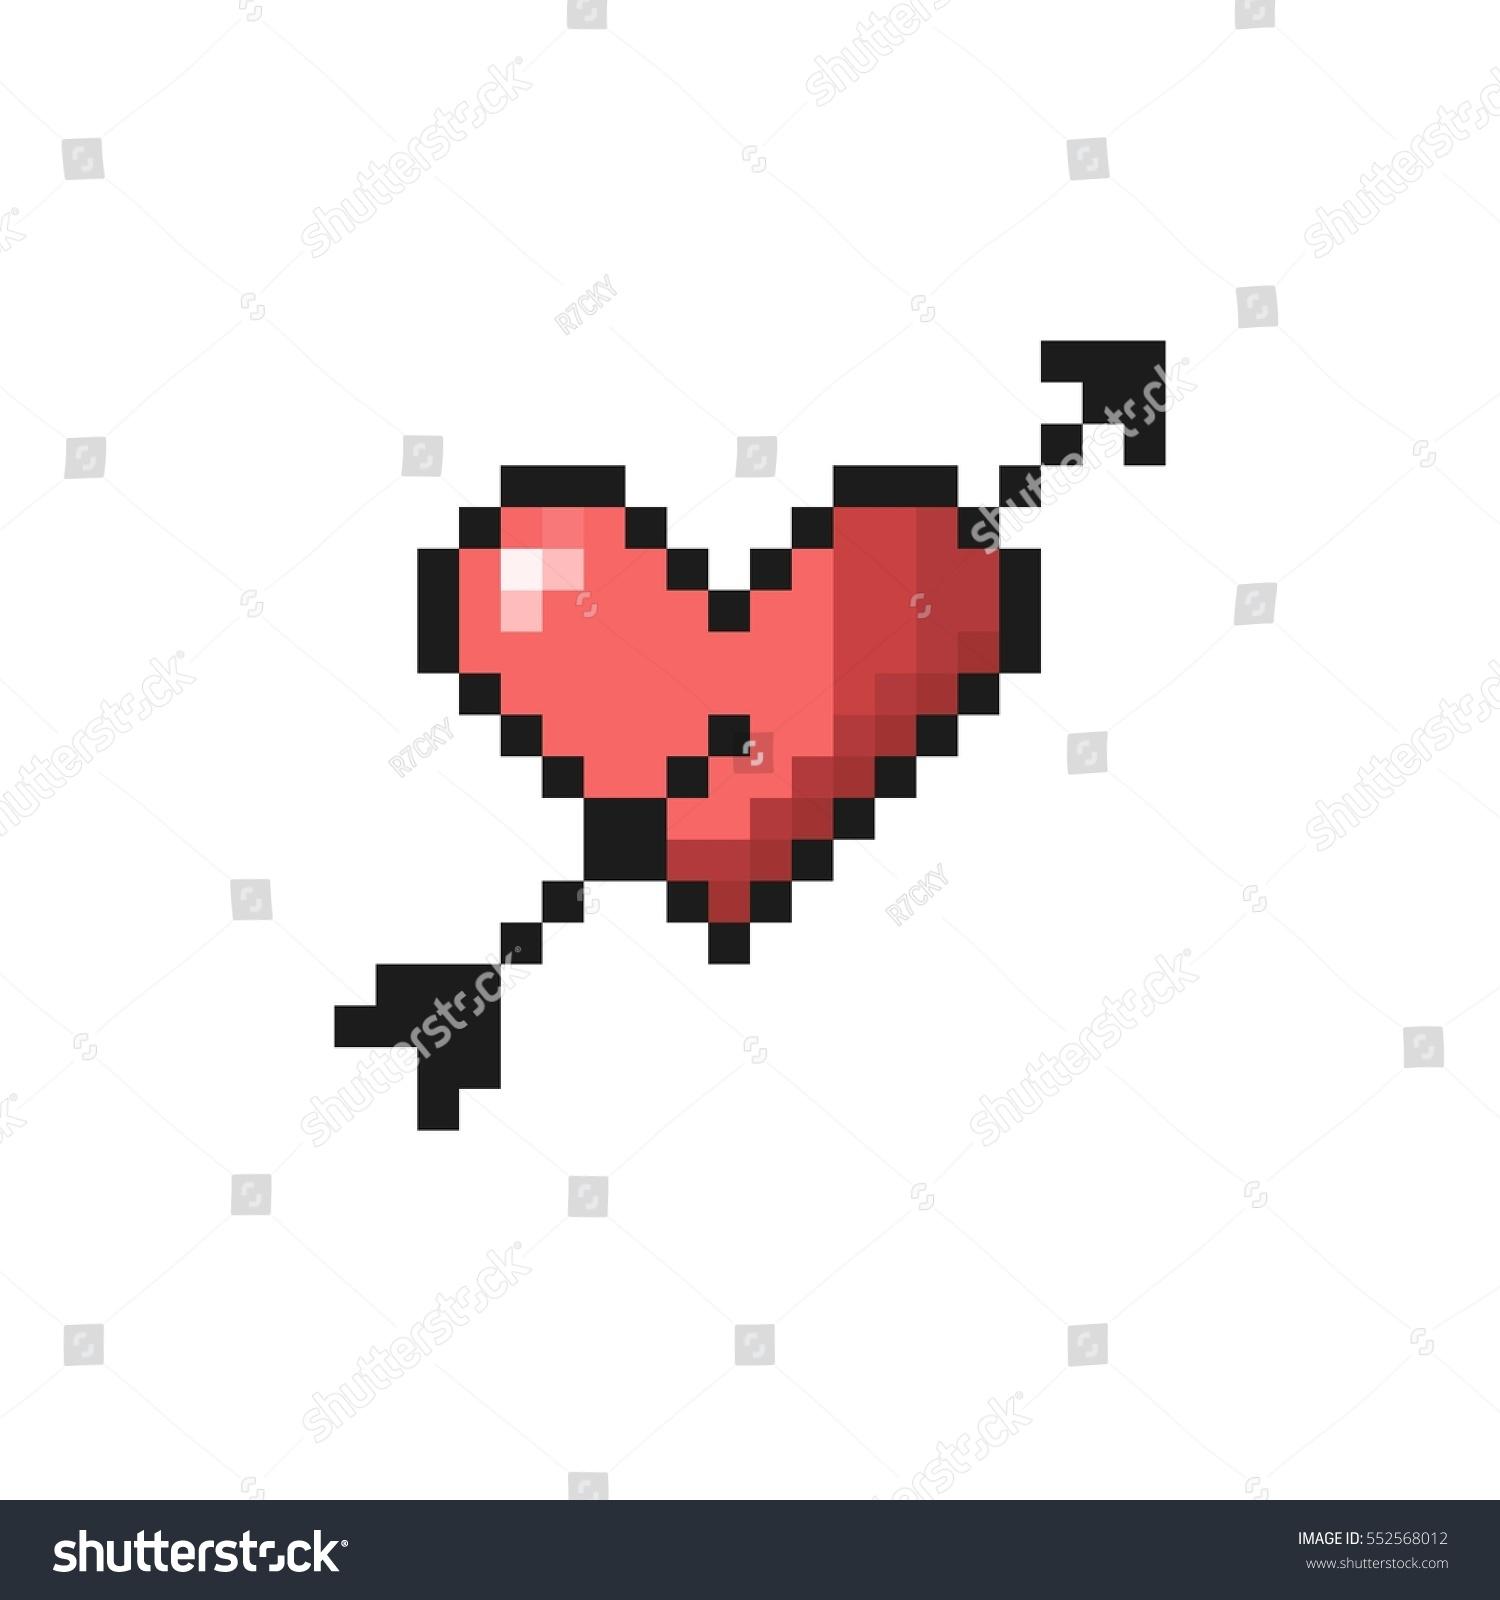 Image Vectorielle De Stock De Heart Arrow Pixel Art 552568012